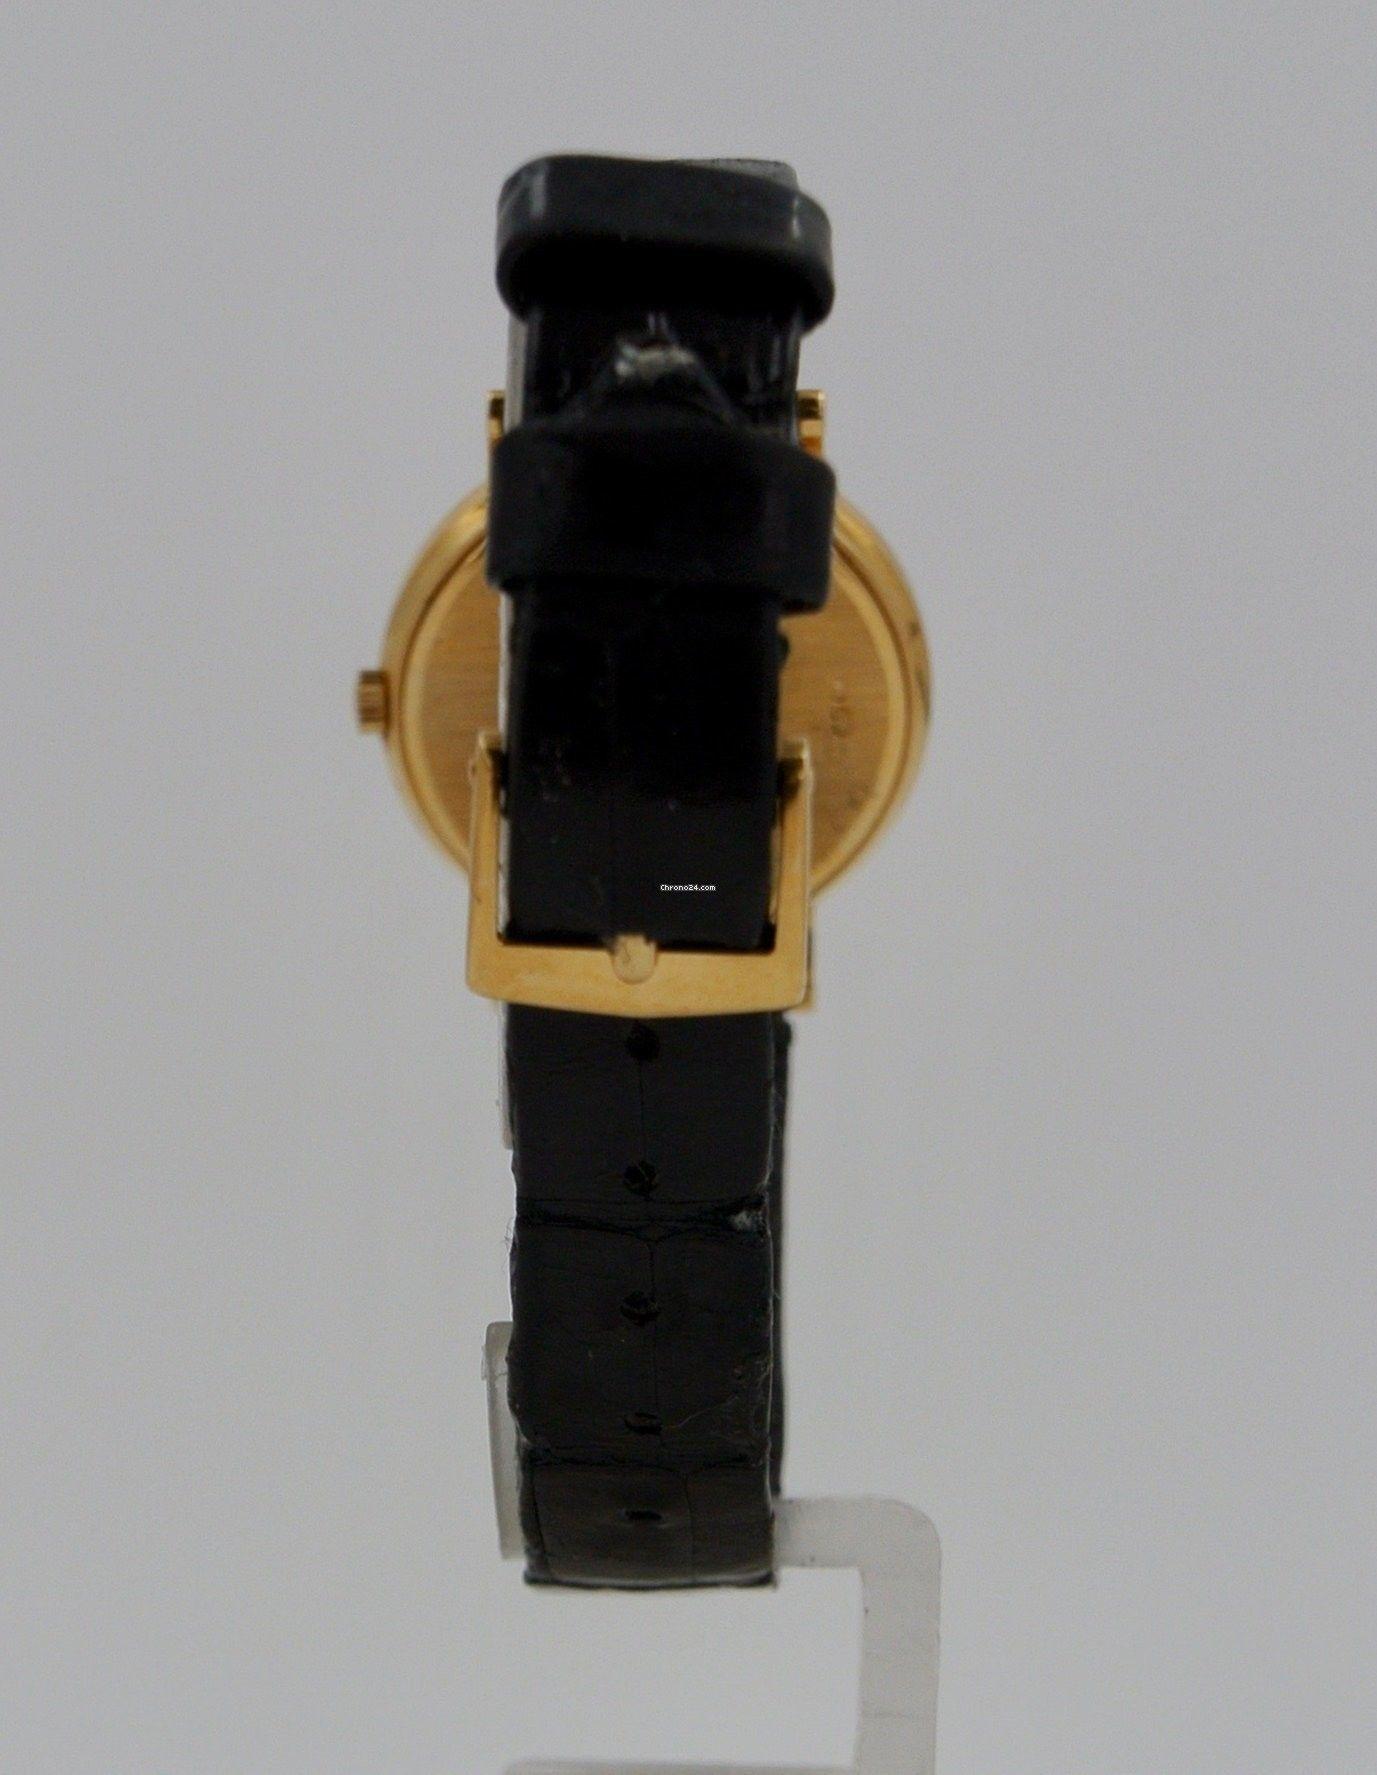 Patek Philippe Calatrava yellow gold